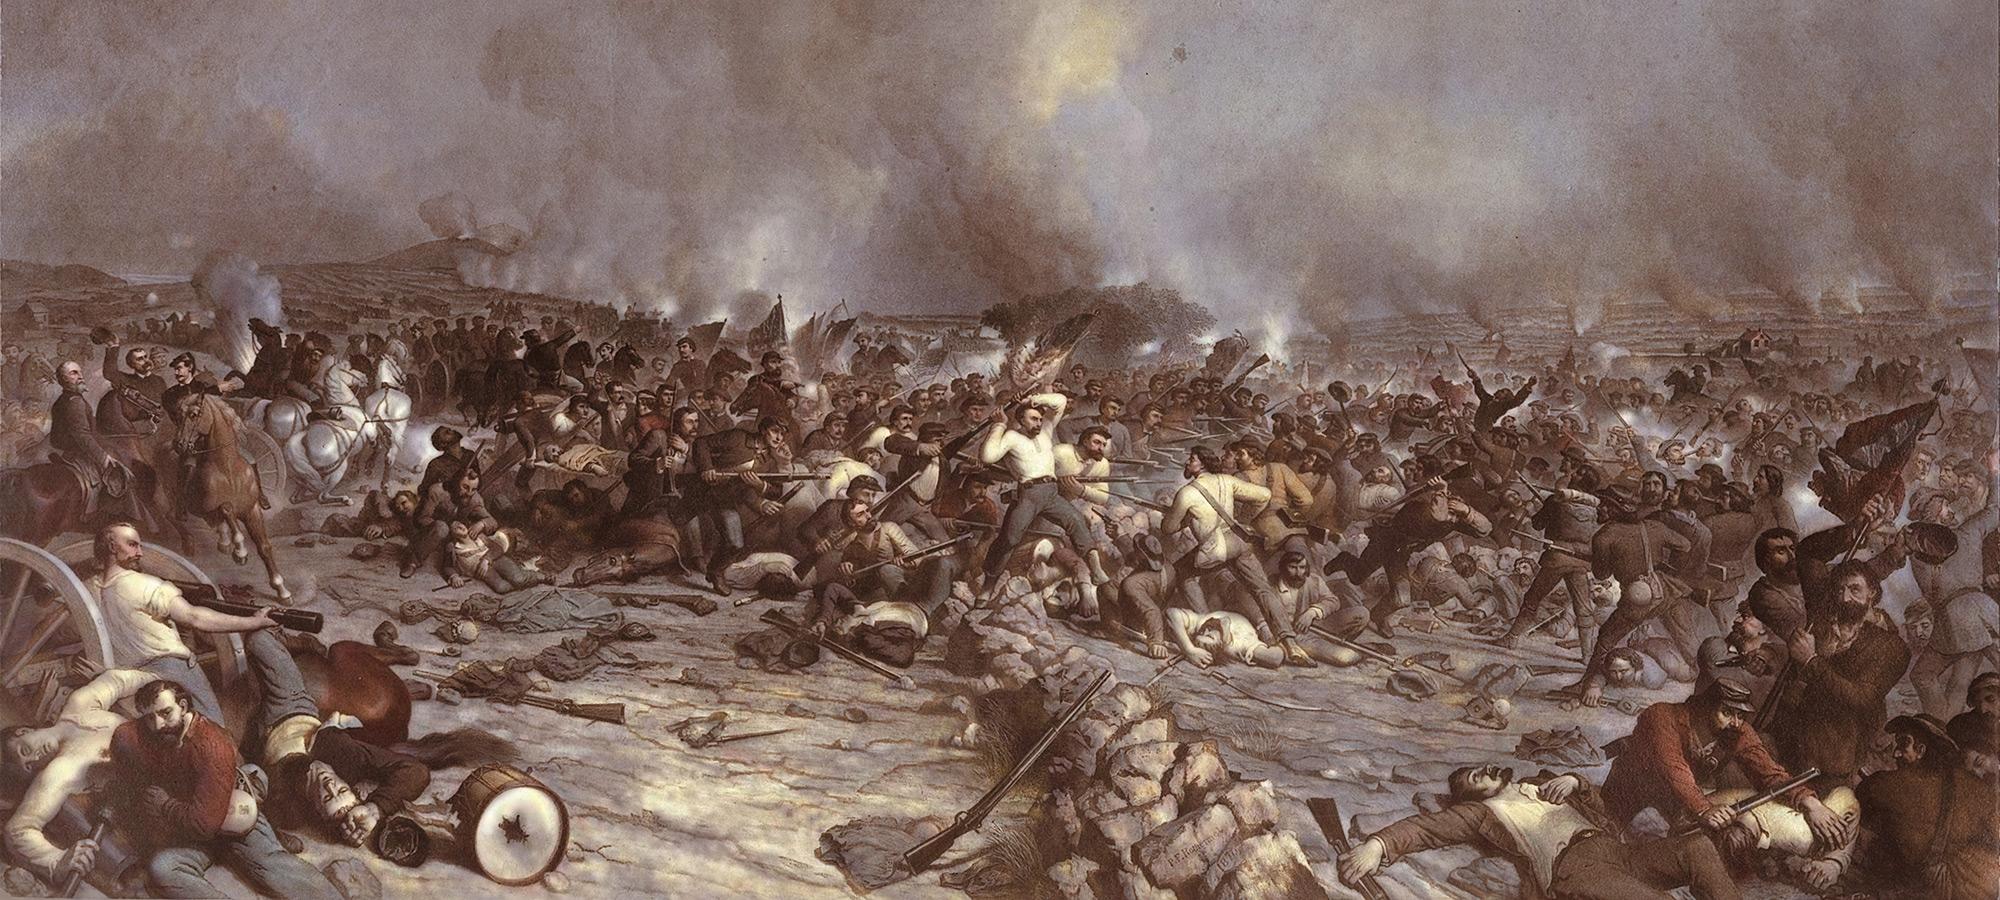 History Battle of Gettysburg Battle of Gettysburg